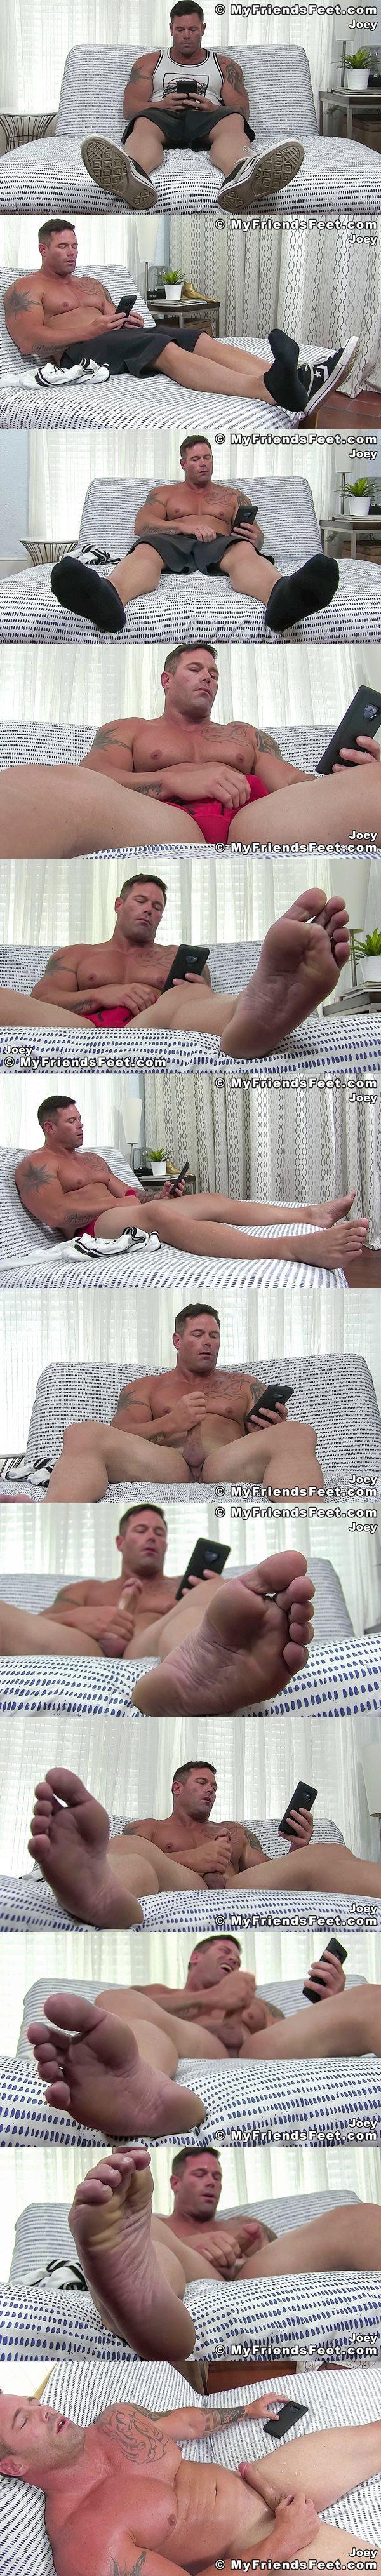 Myfriendsfeet - Joey J - Jackoff and Tickling 02